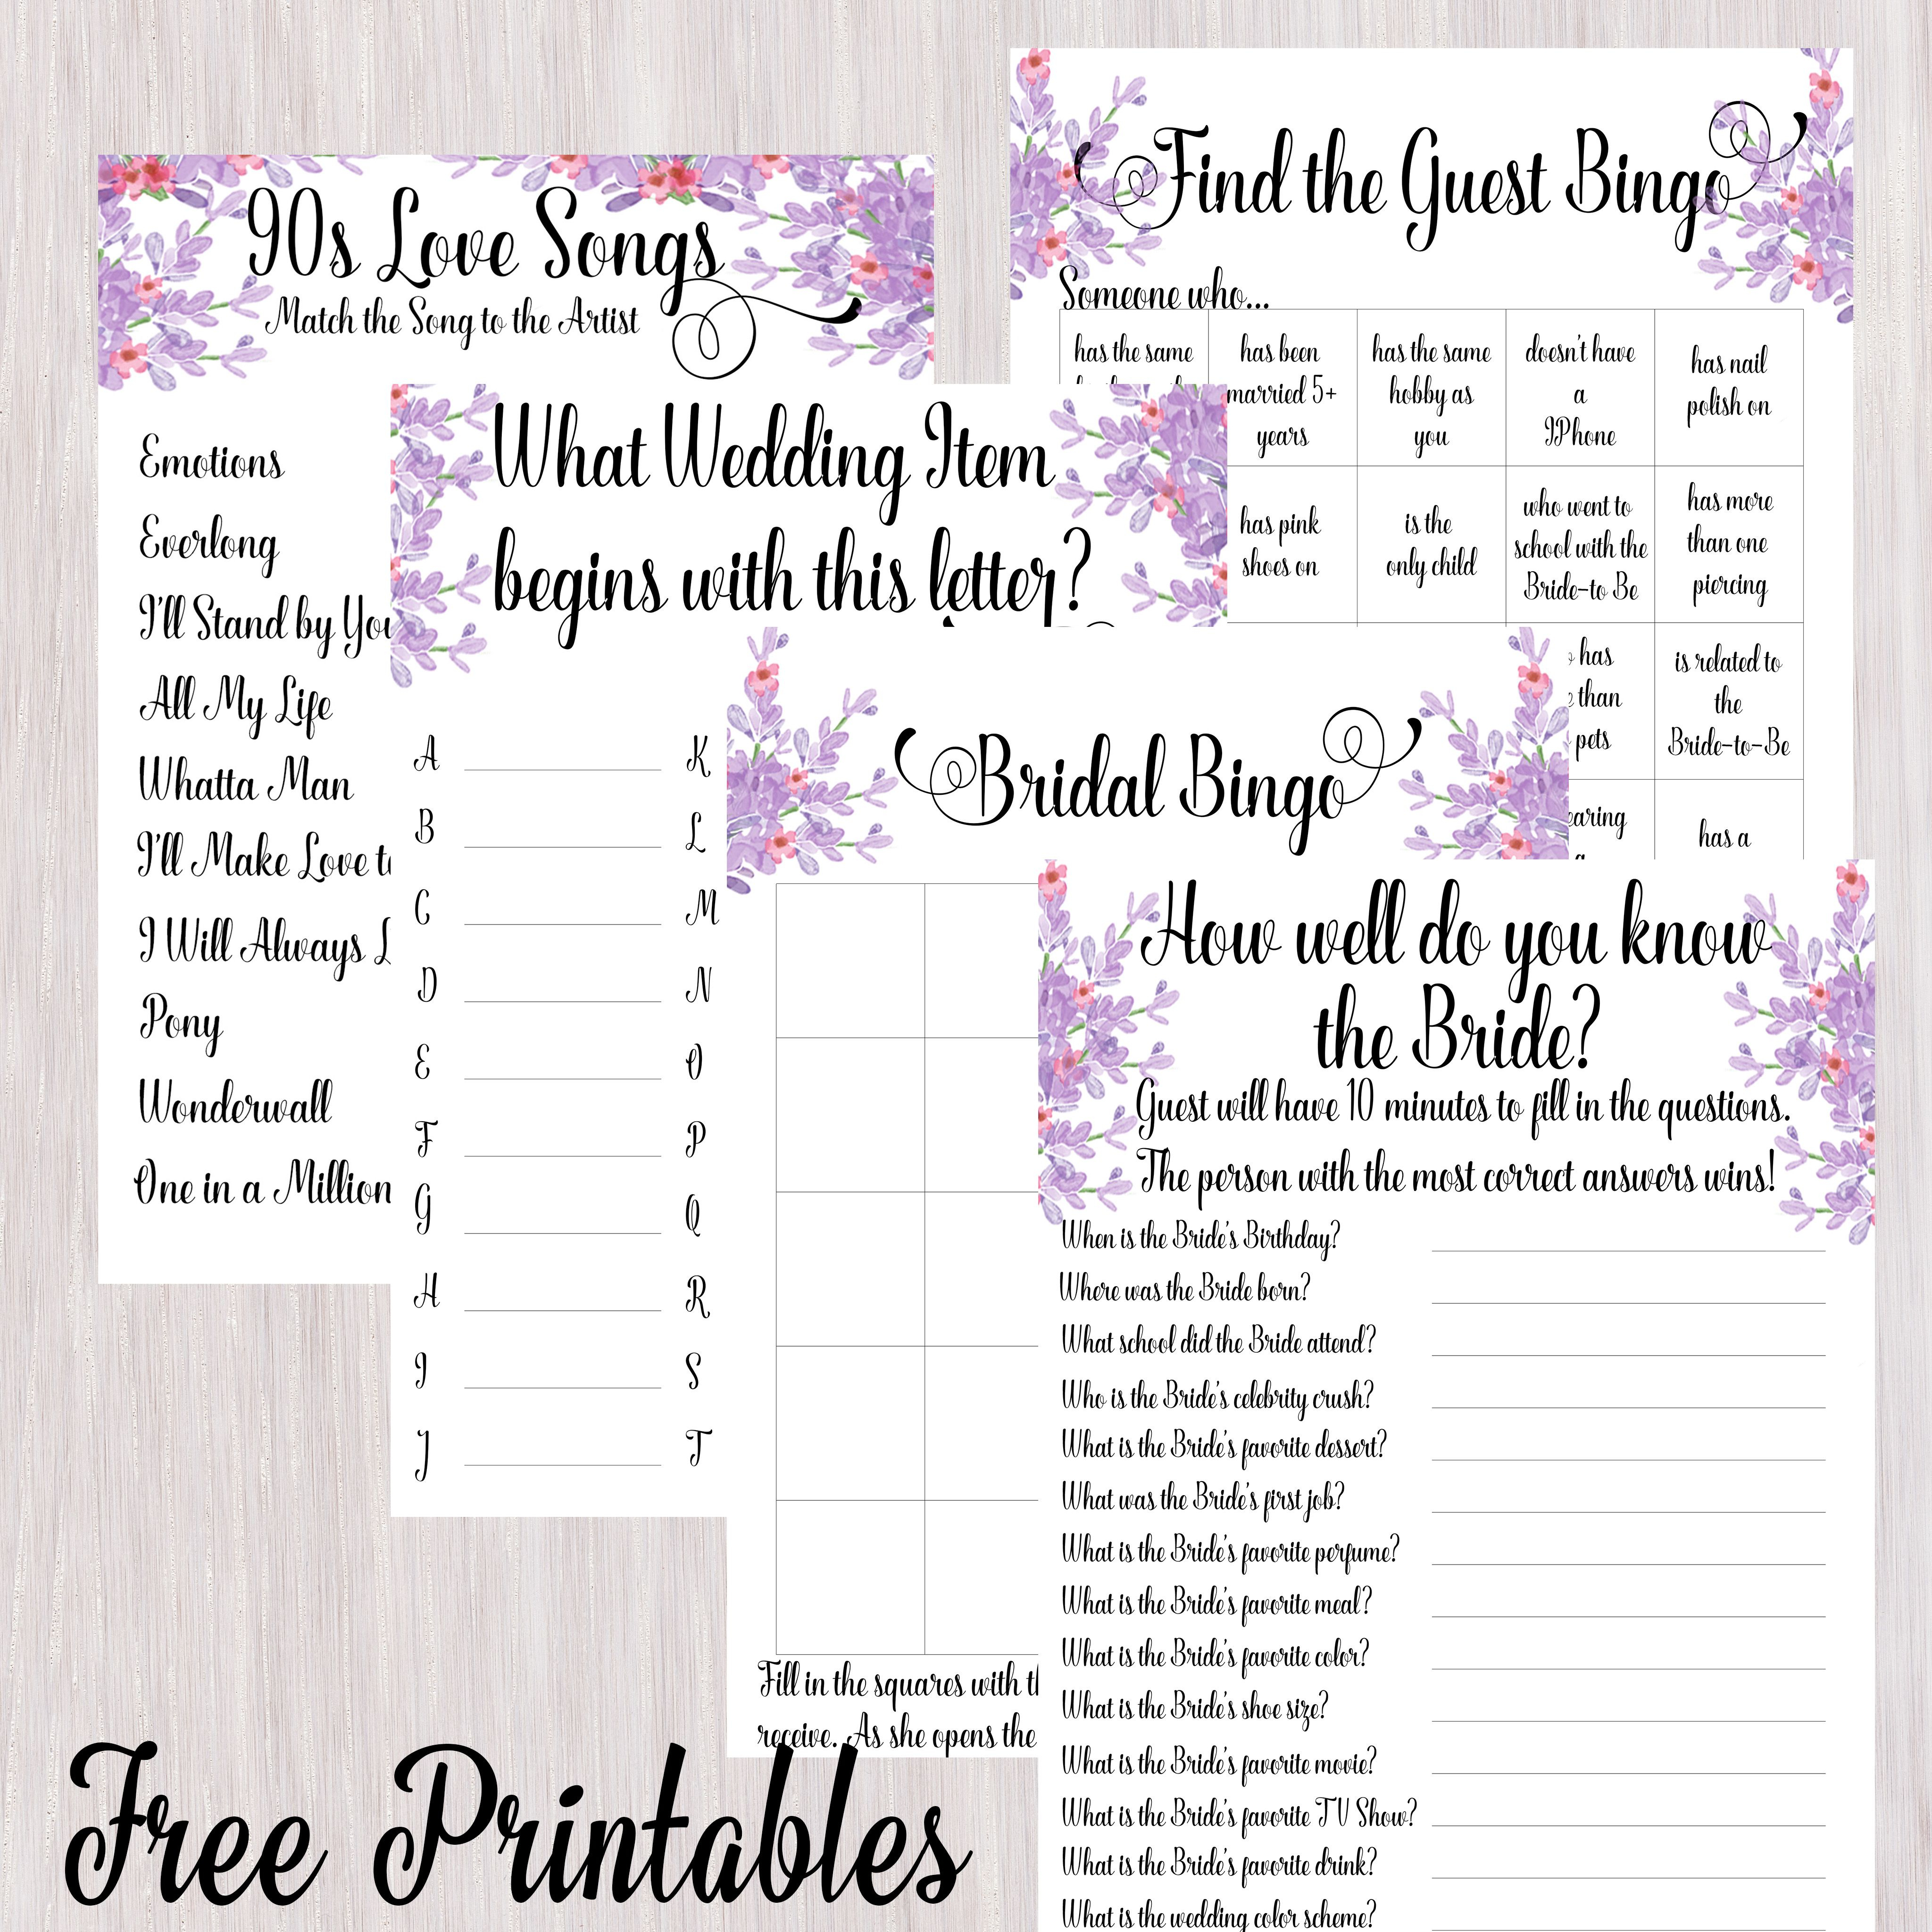 Free Printable Bridal Shower Games Disney Love Songs 90S Love Songs - Free Printable Bridal Shower Raffle Tickets